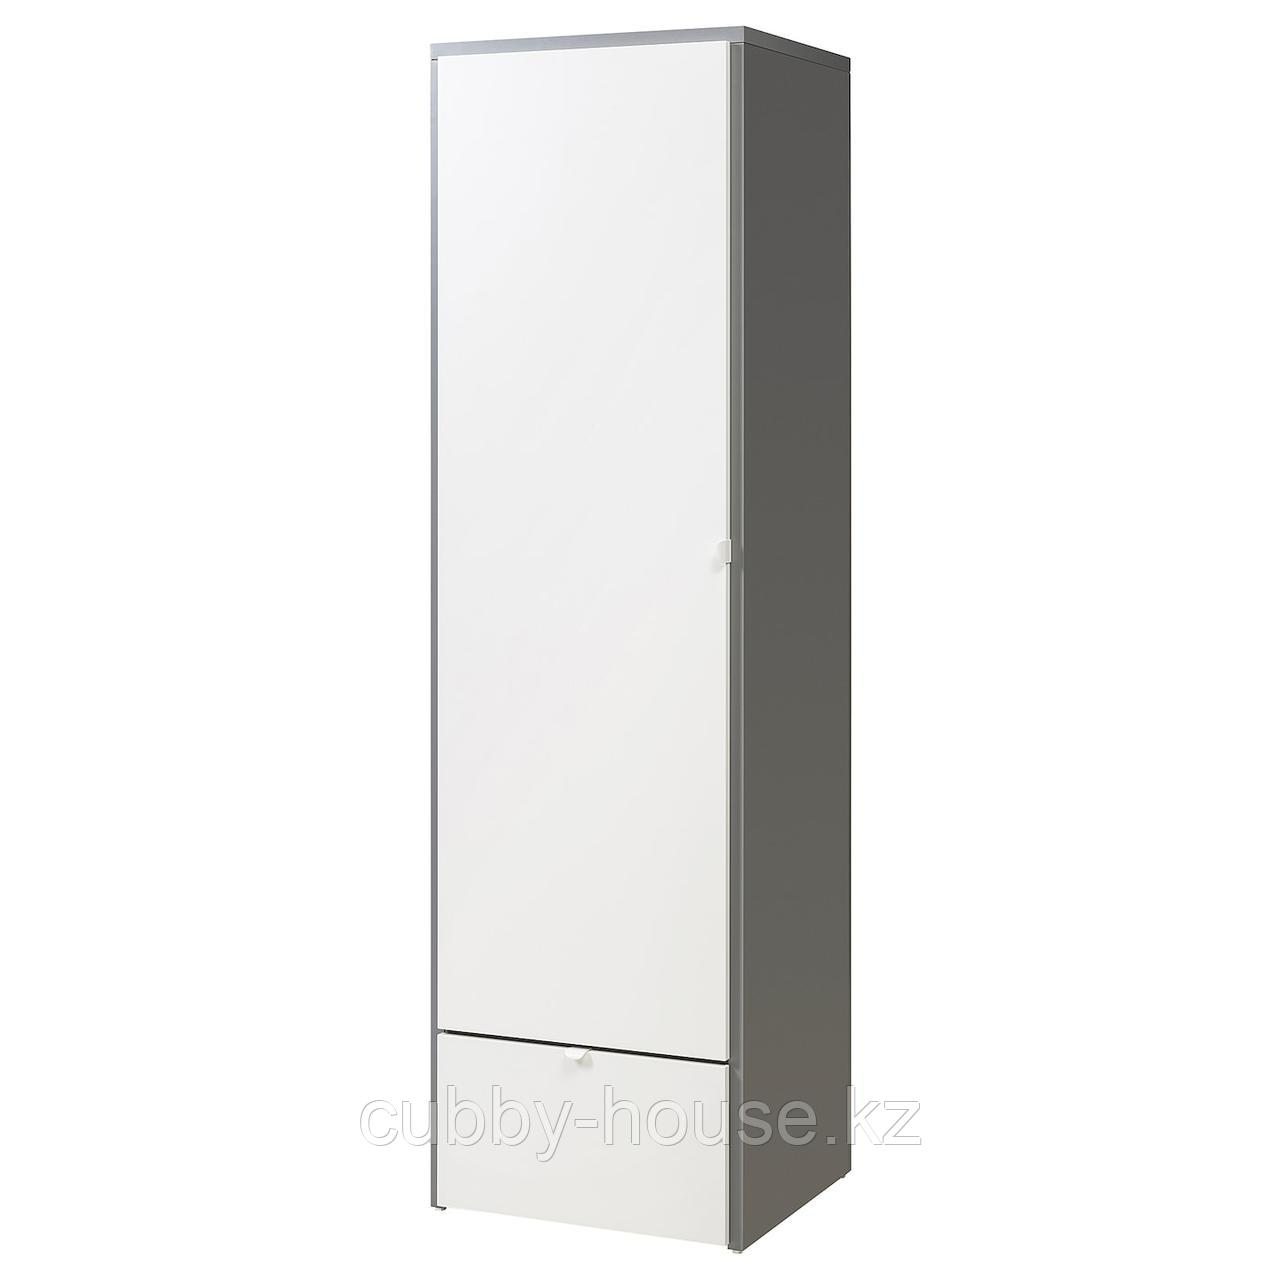 ВИСТХУС Гардероб, серый, белый, 63x59x216 см